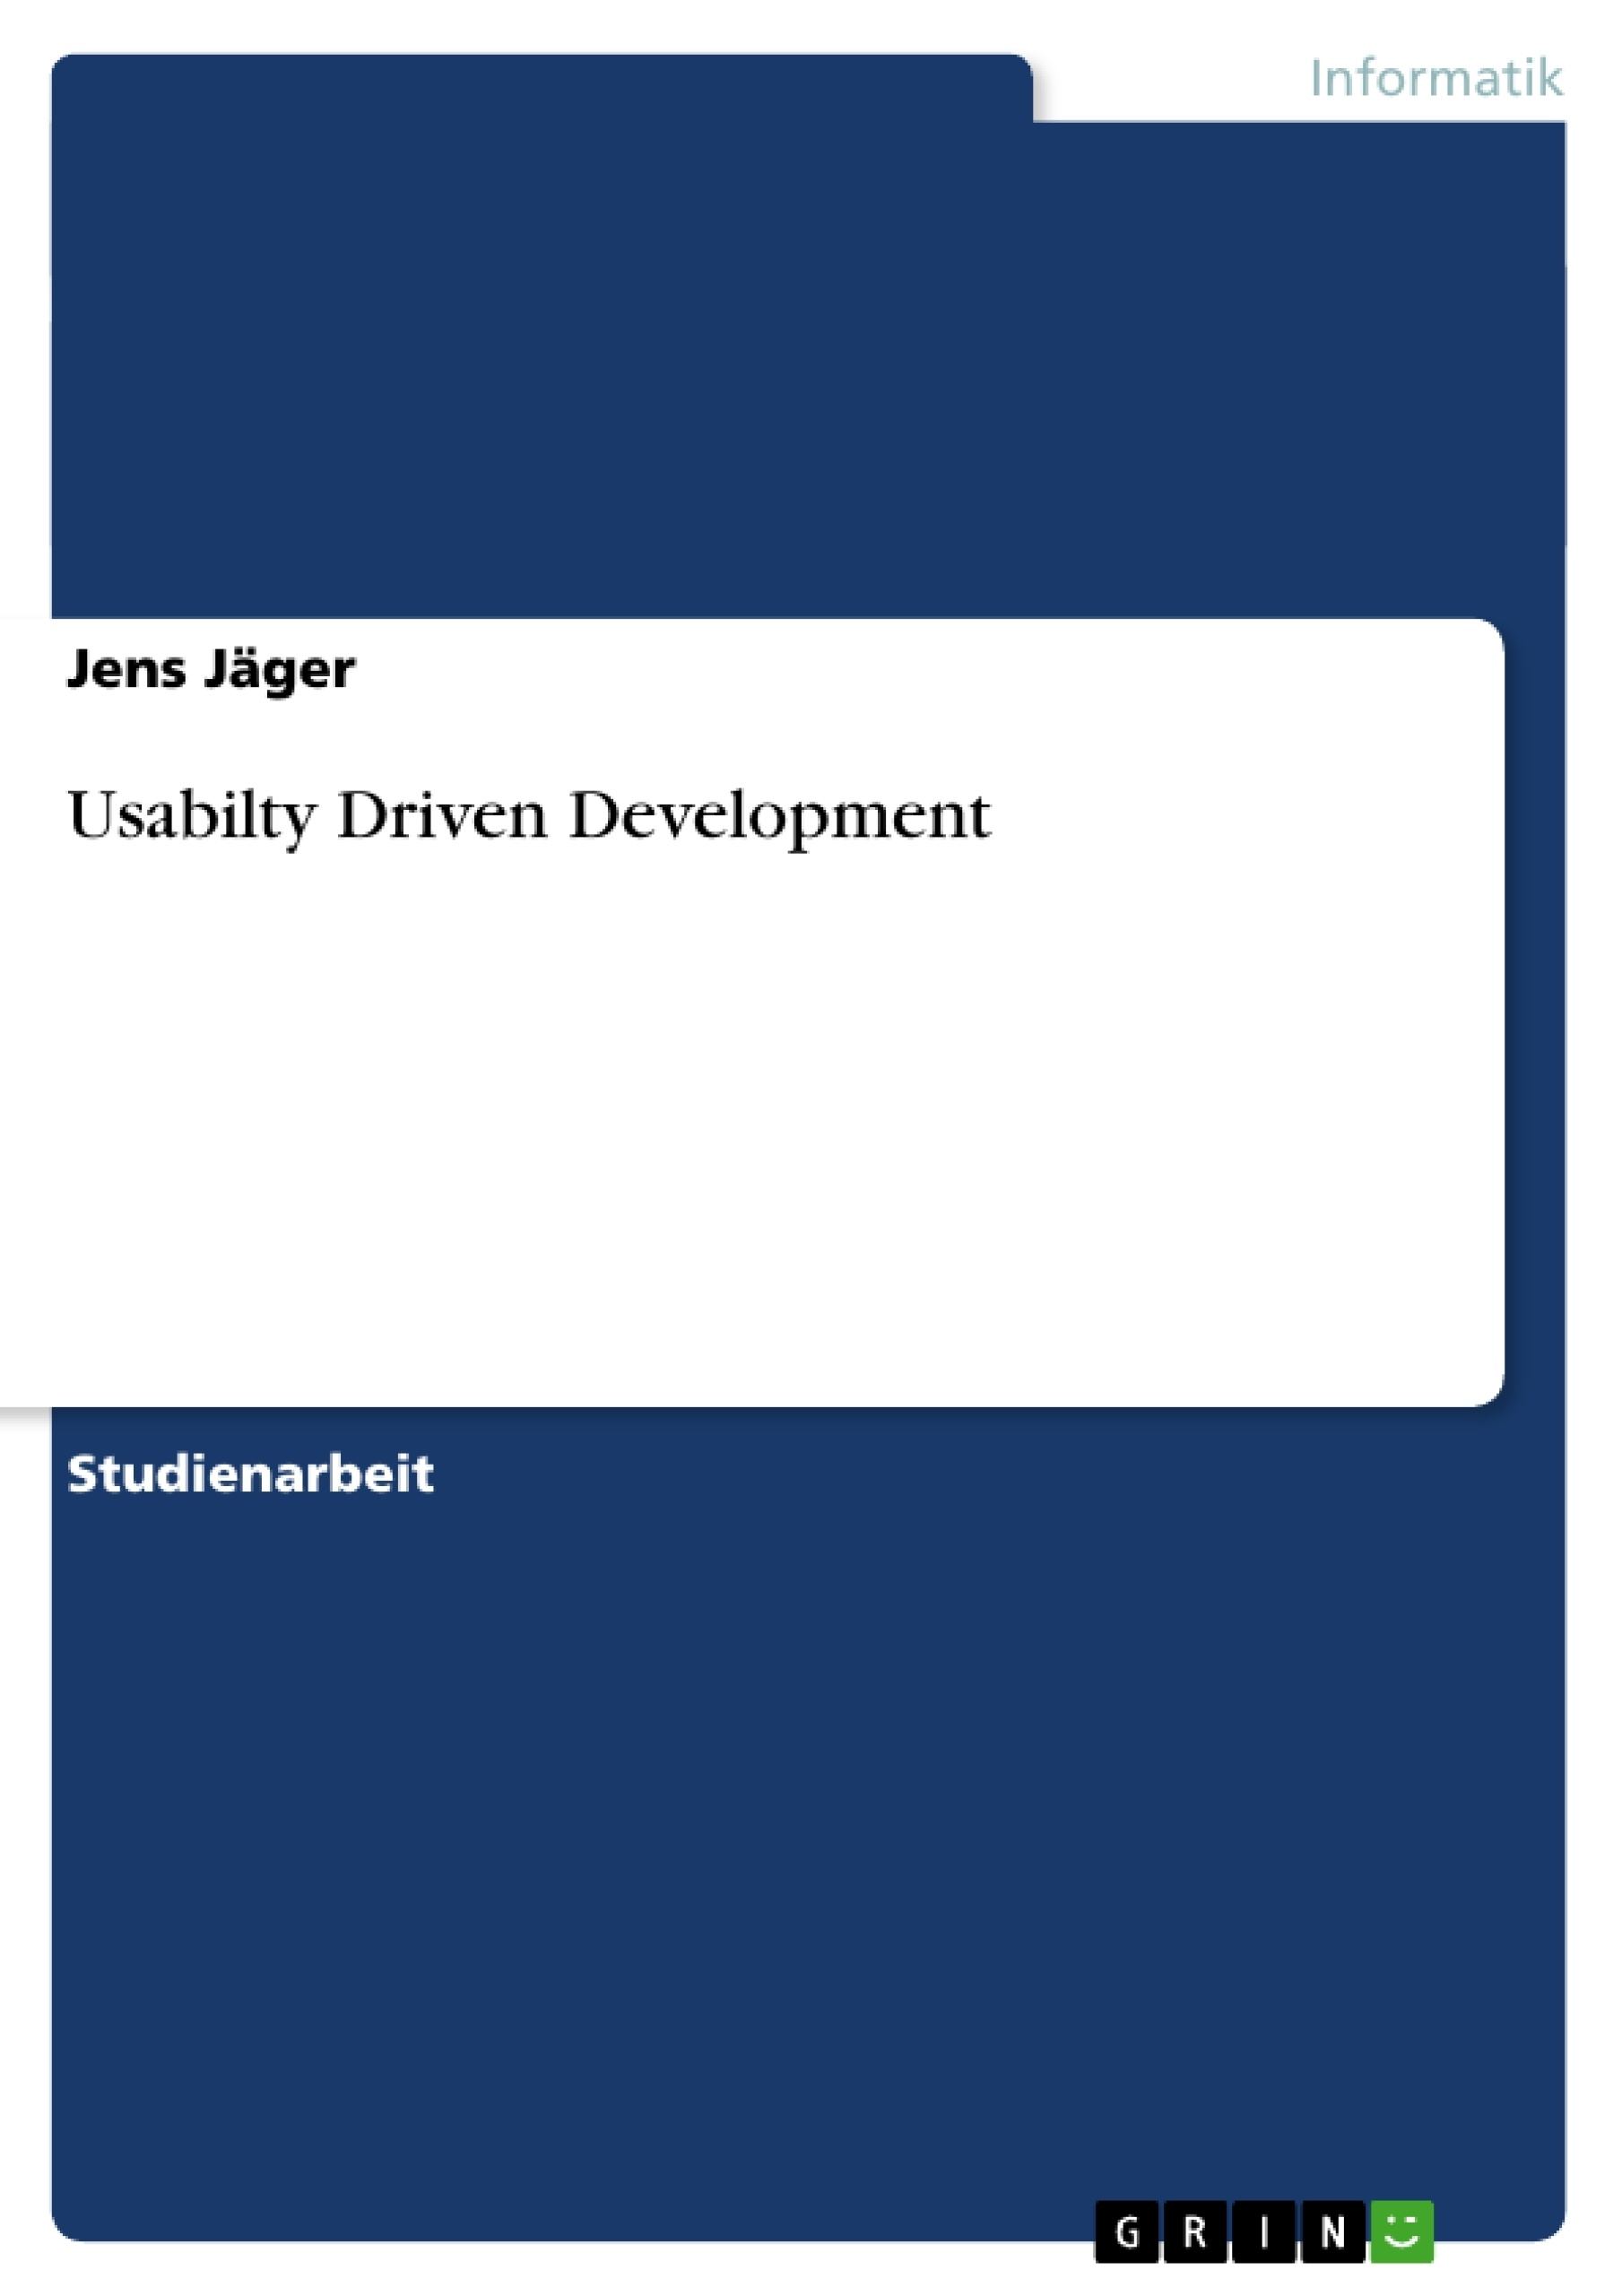 Titel: Usabilty Driven Development